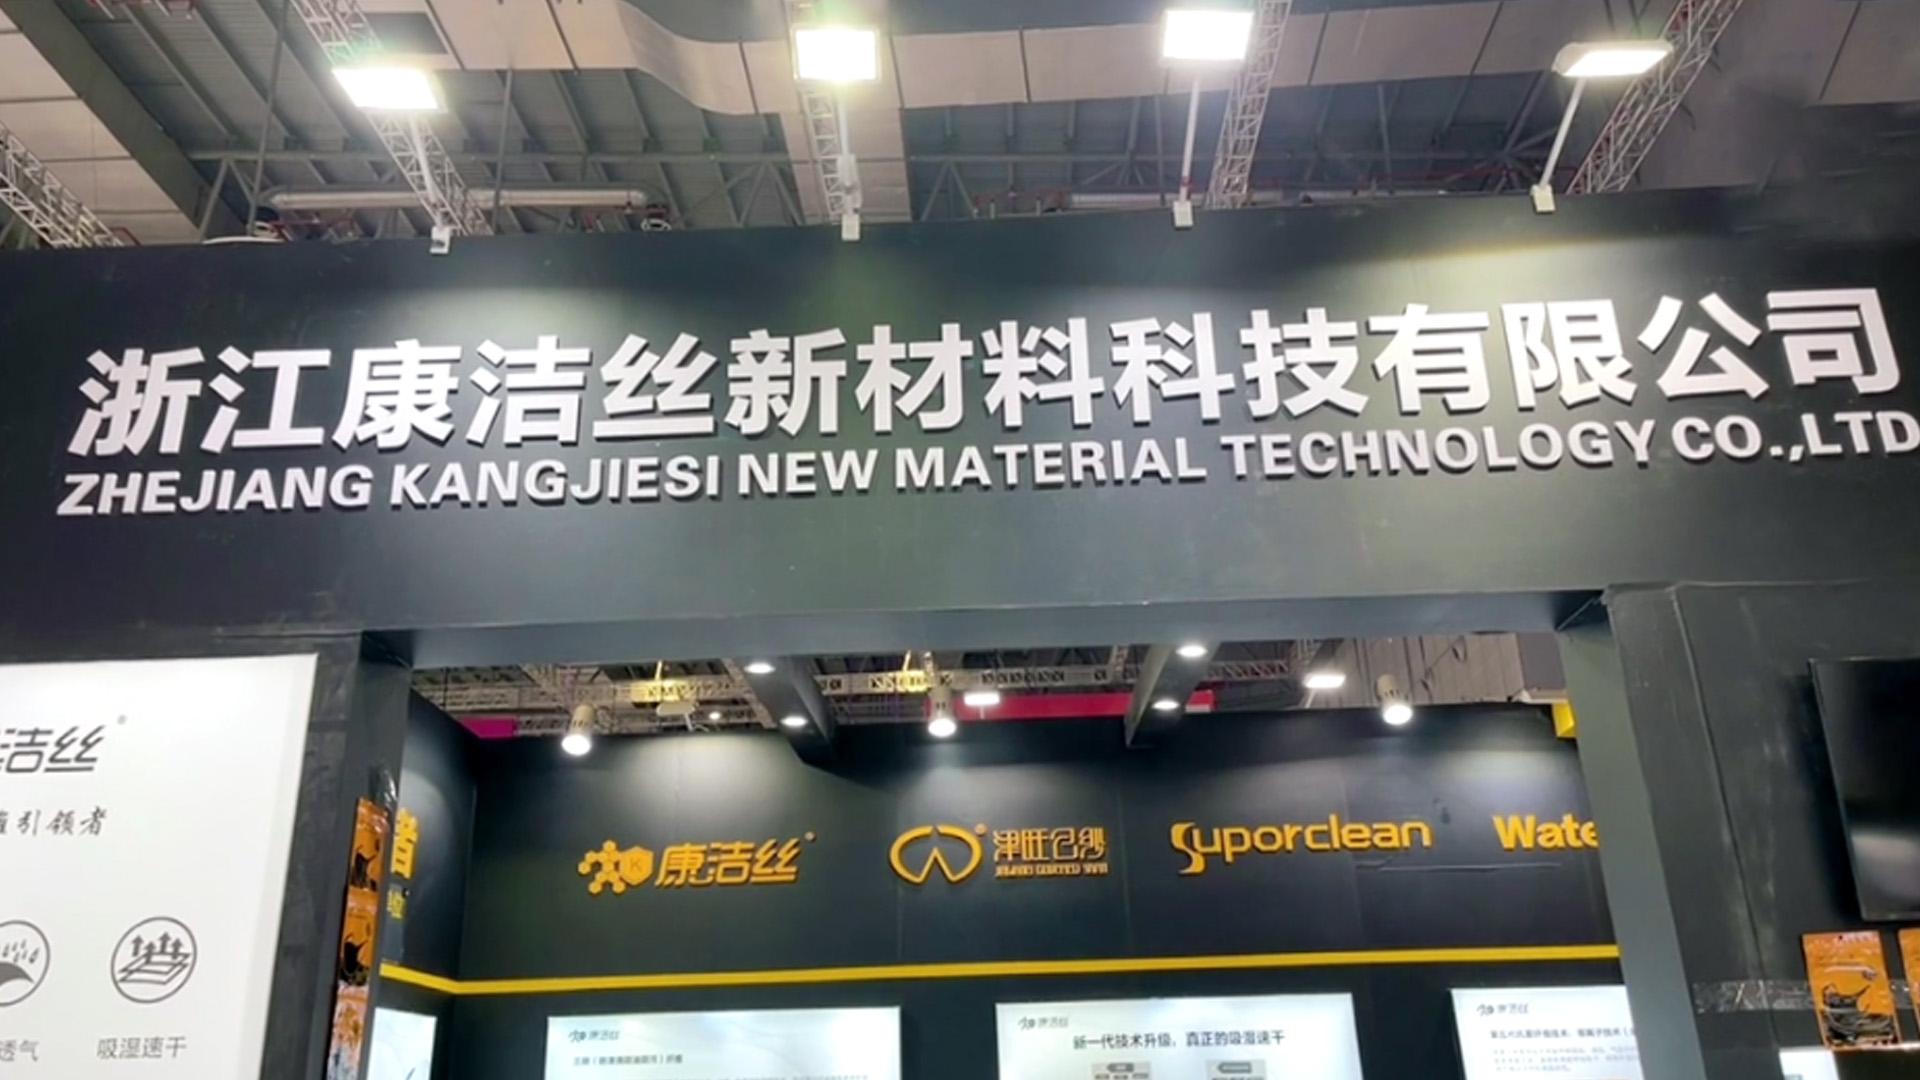 Visiting Shanghai expo KangJieSi New Material